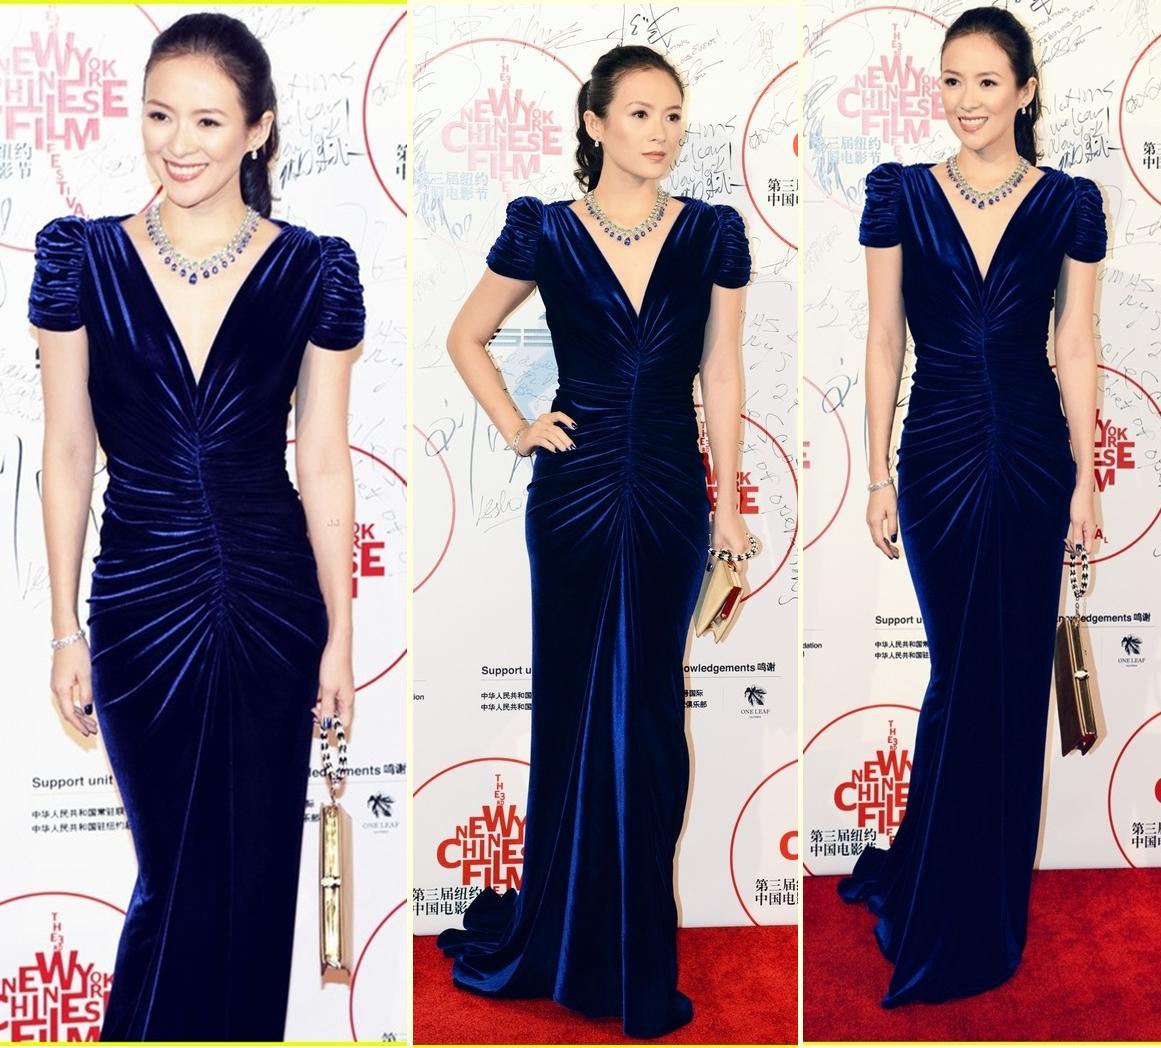 http://3.bp.blogspot.com/-8NWBfE1spAw/UIOjgwDBUSI/AAAAAAAAPD8/m80kkVdOMTc/s1600/ziyi-zhang-outstanding-artist-award-chinese-film-festival-01.JPG